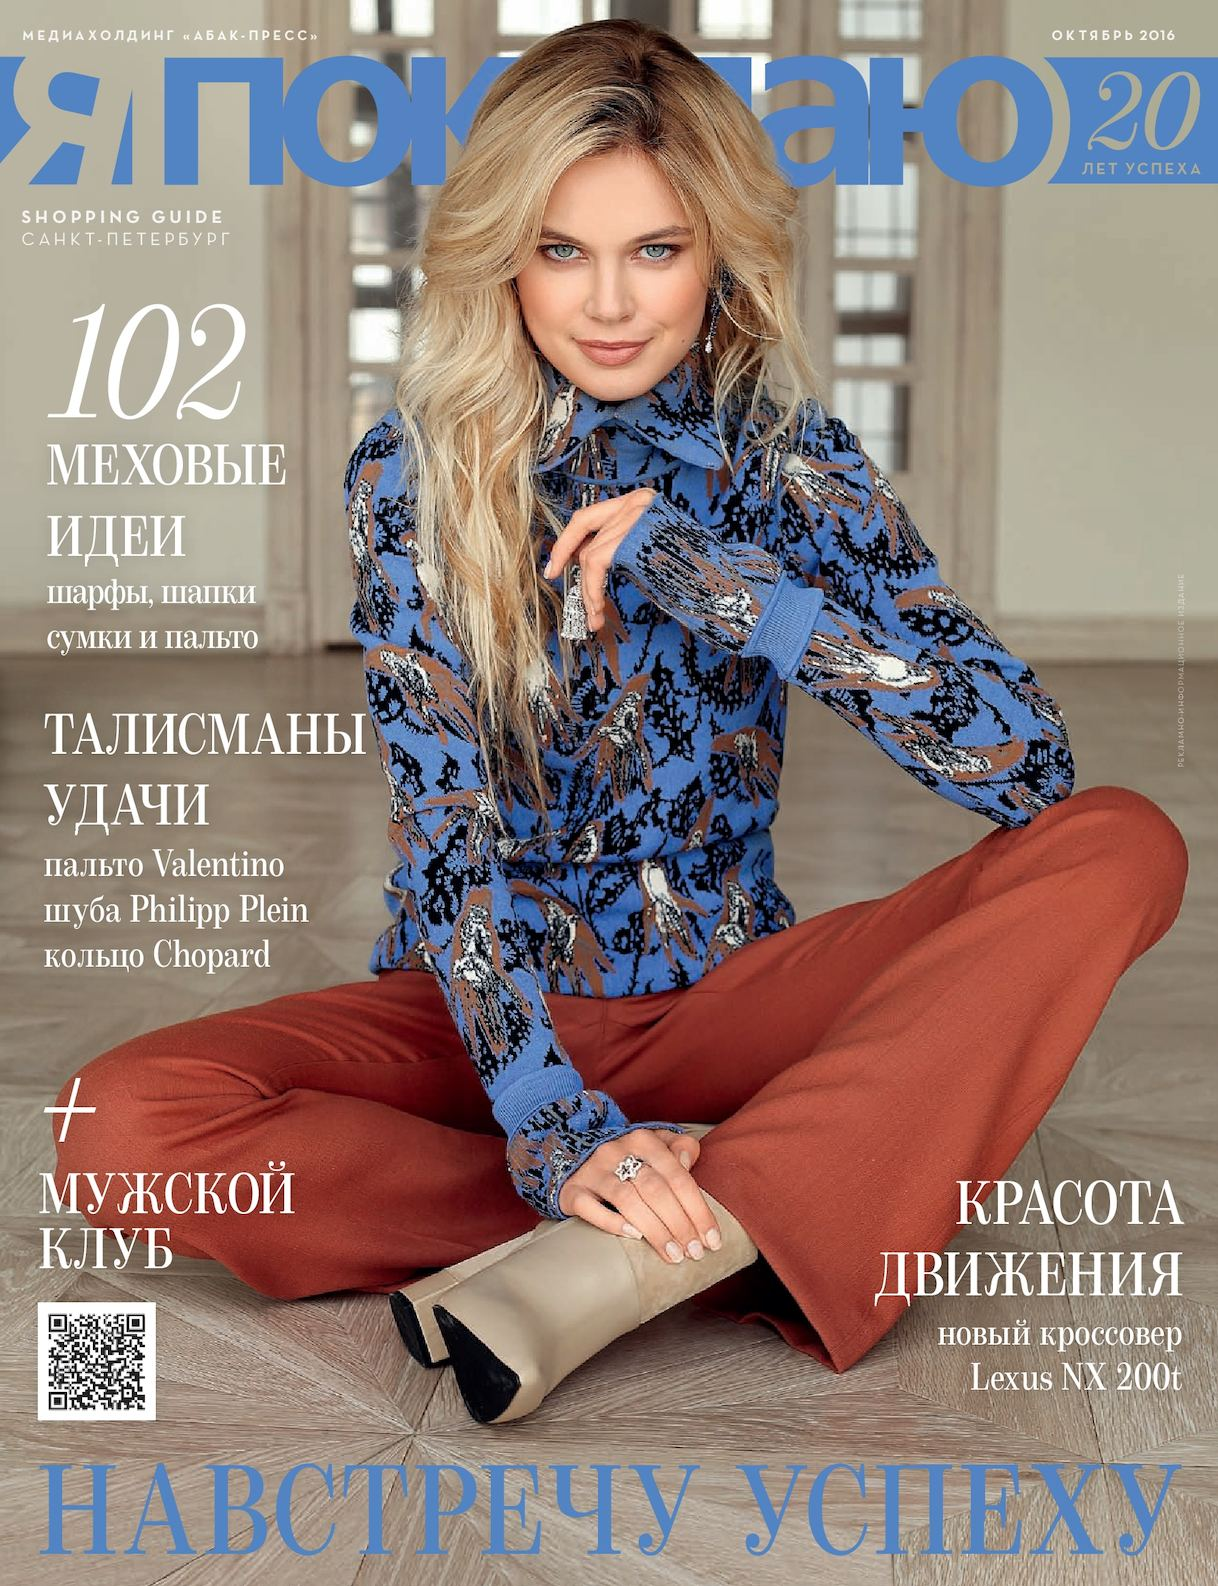 967546f09c7b Calaméo - Электронная версия Shopping Guide «Я Покупаю. Санкт-Петербург»,  Октябрь 2016